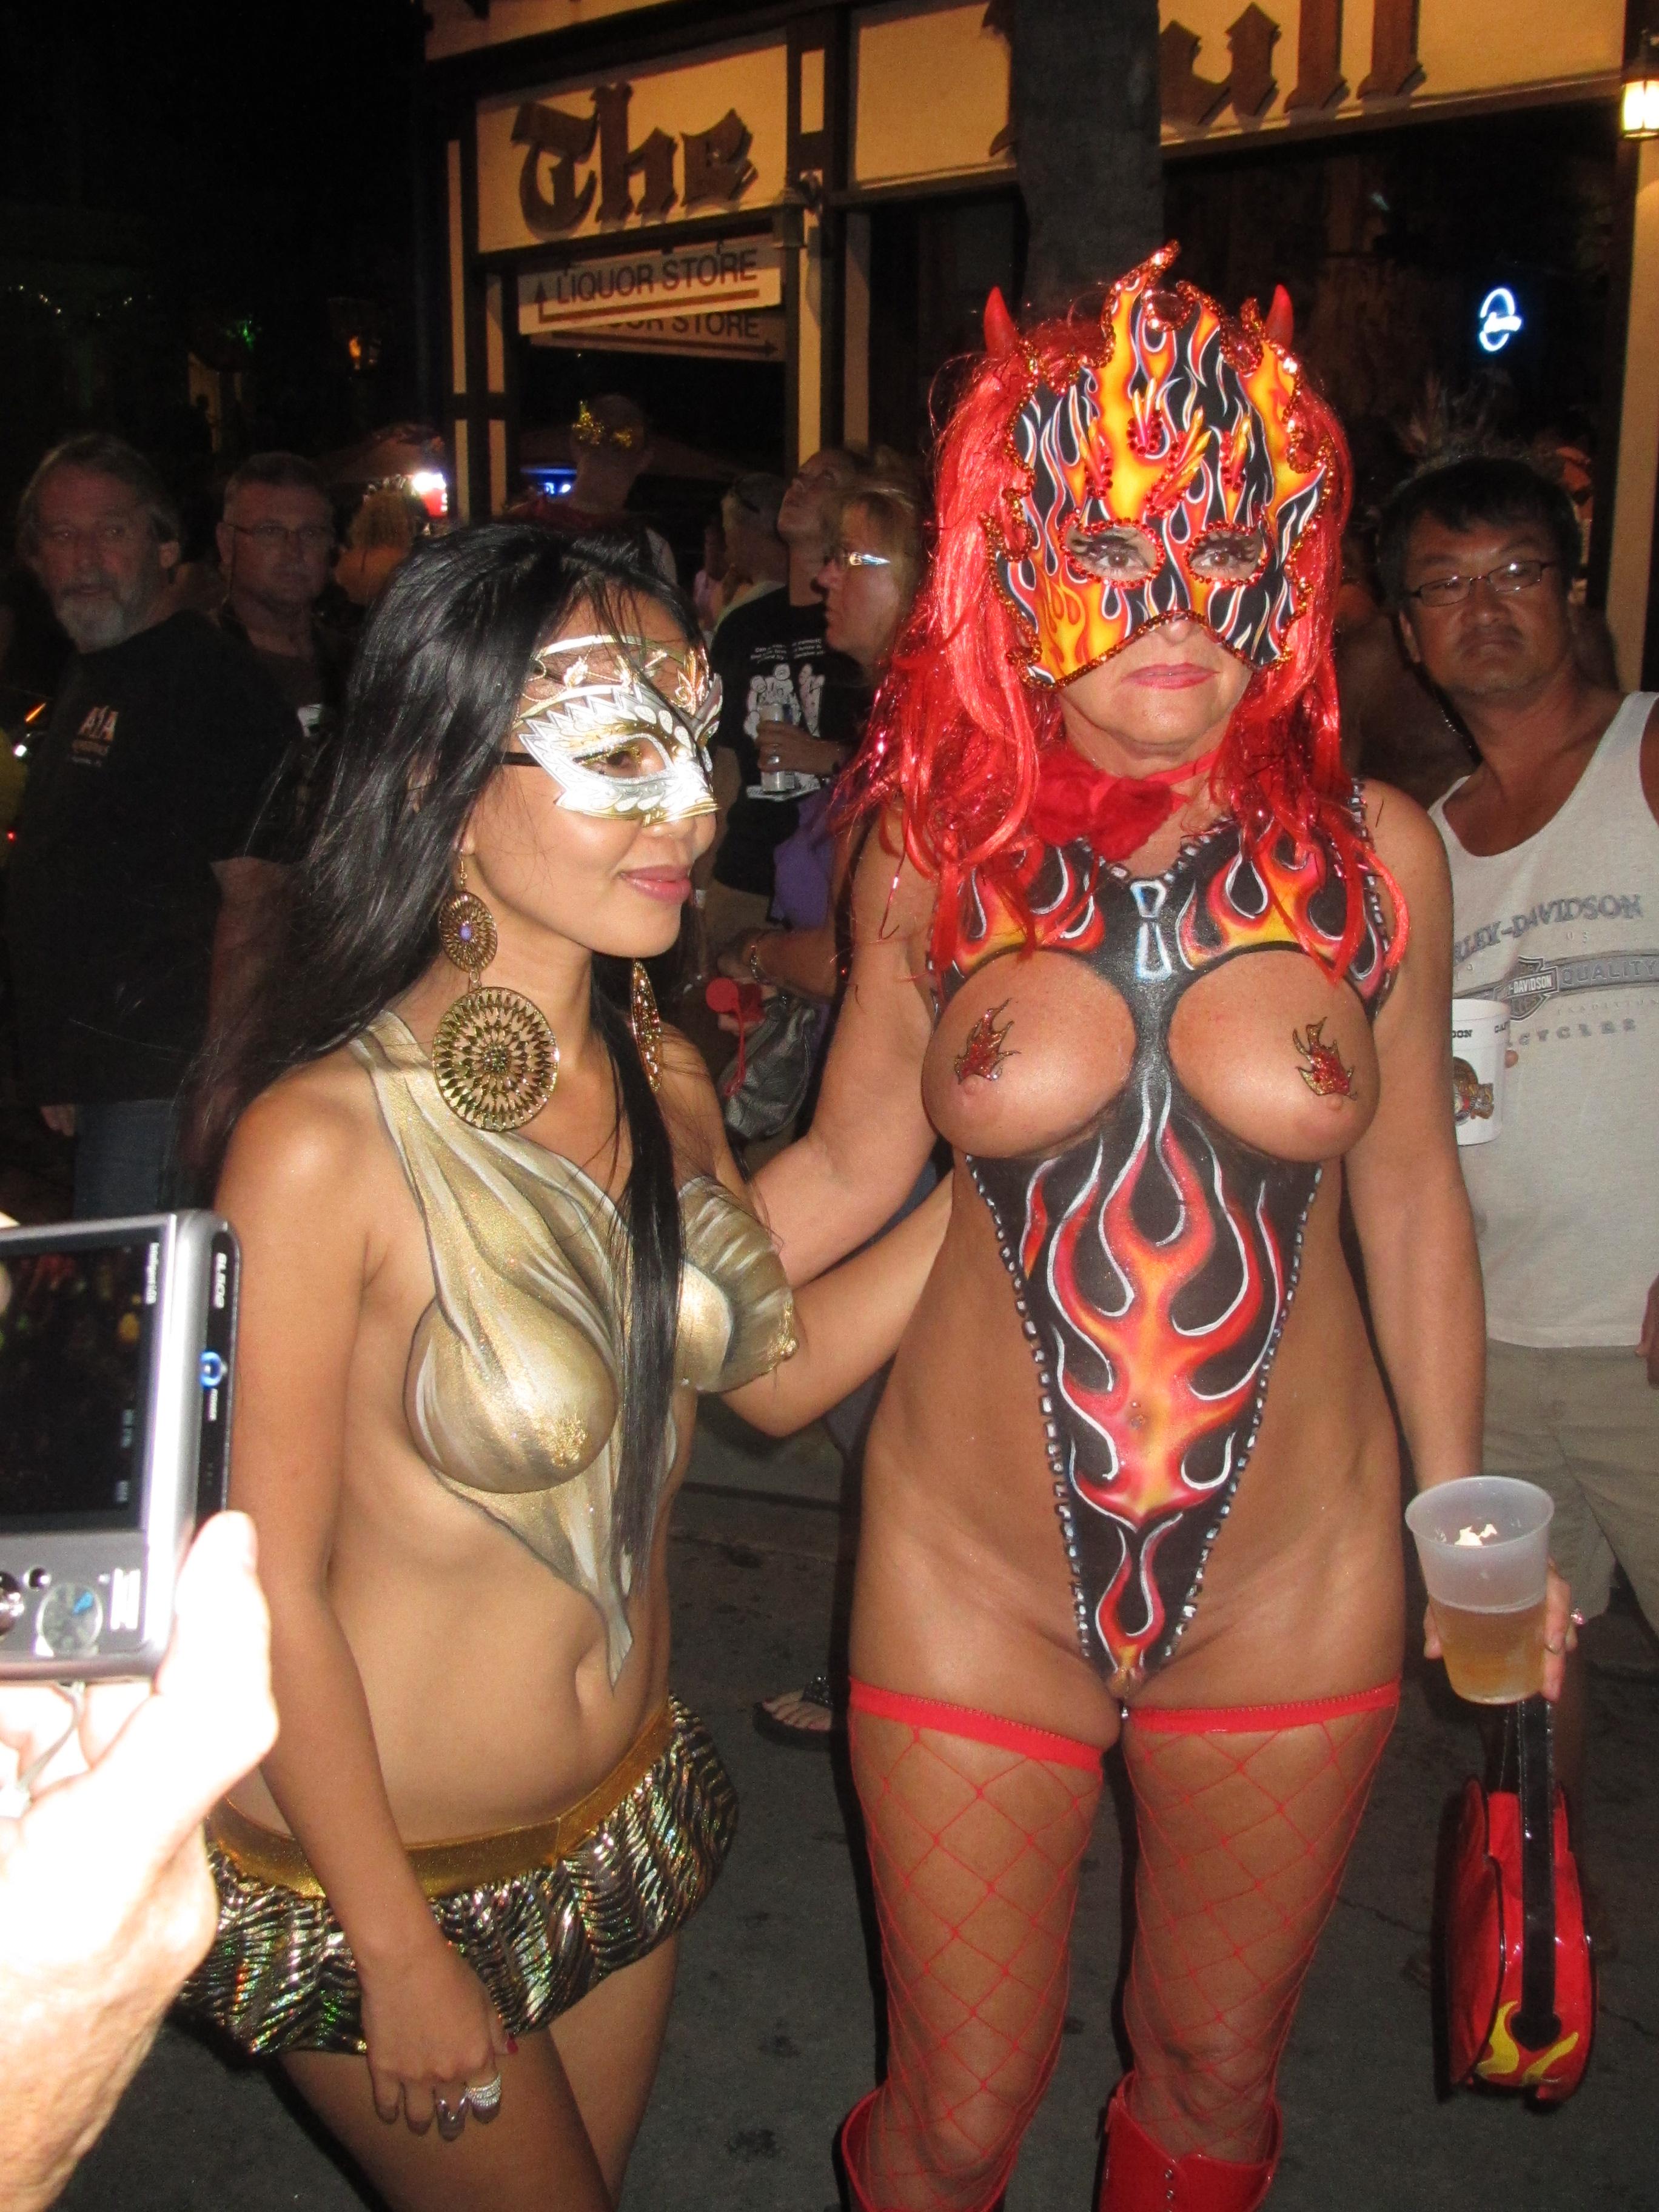 Fantasy fest 2013 upskirts at the bar - 3 part 8